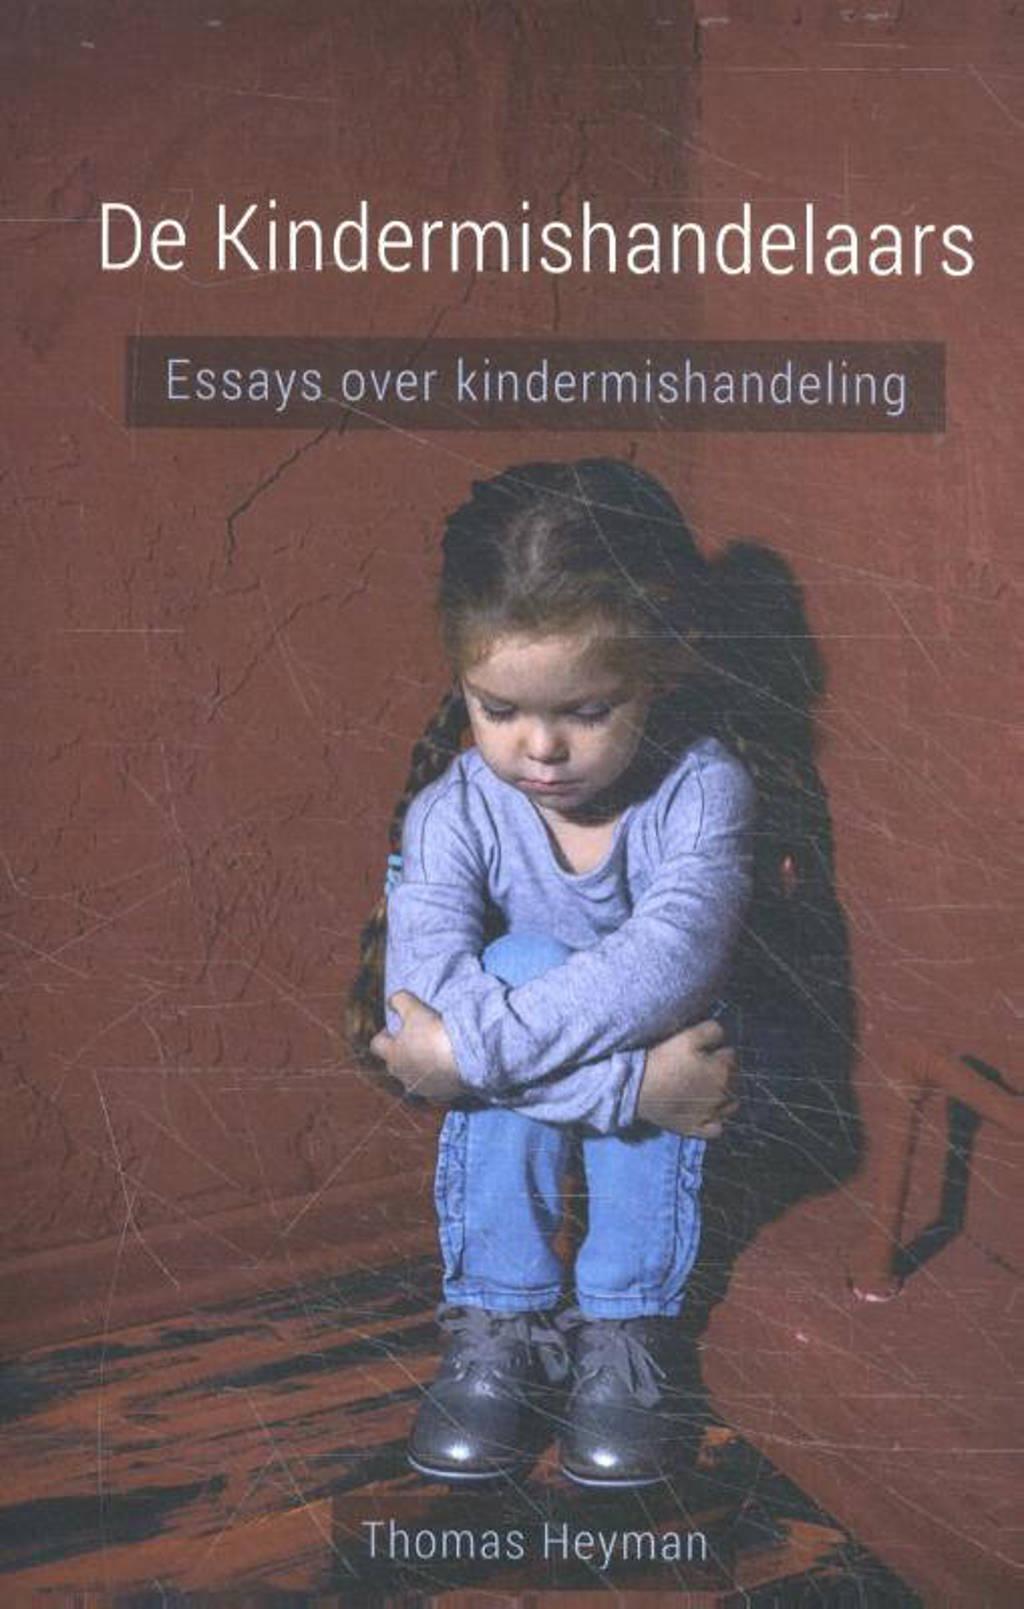 De kindermishandelaars - Thomas Heyman